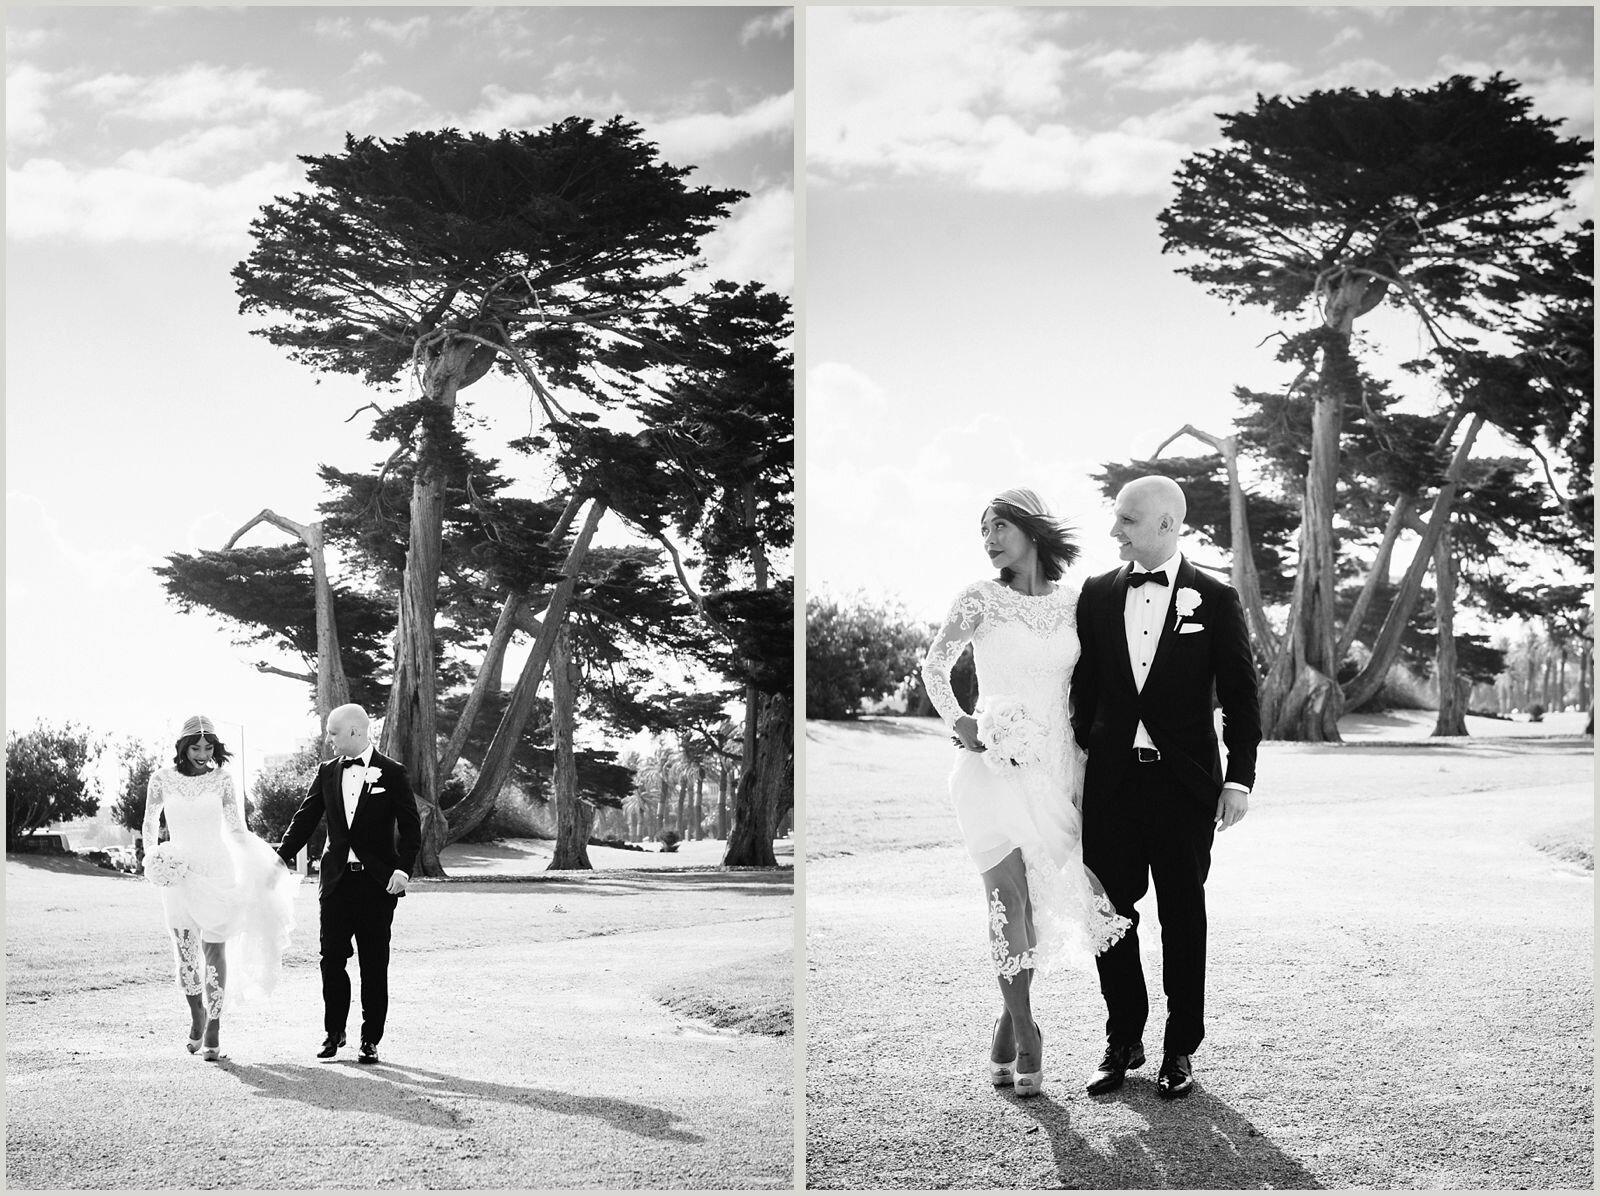 joseph_koprek_wedding_melbourne_the_prince_deck_0031.jpg